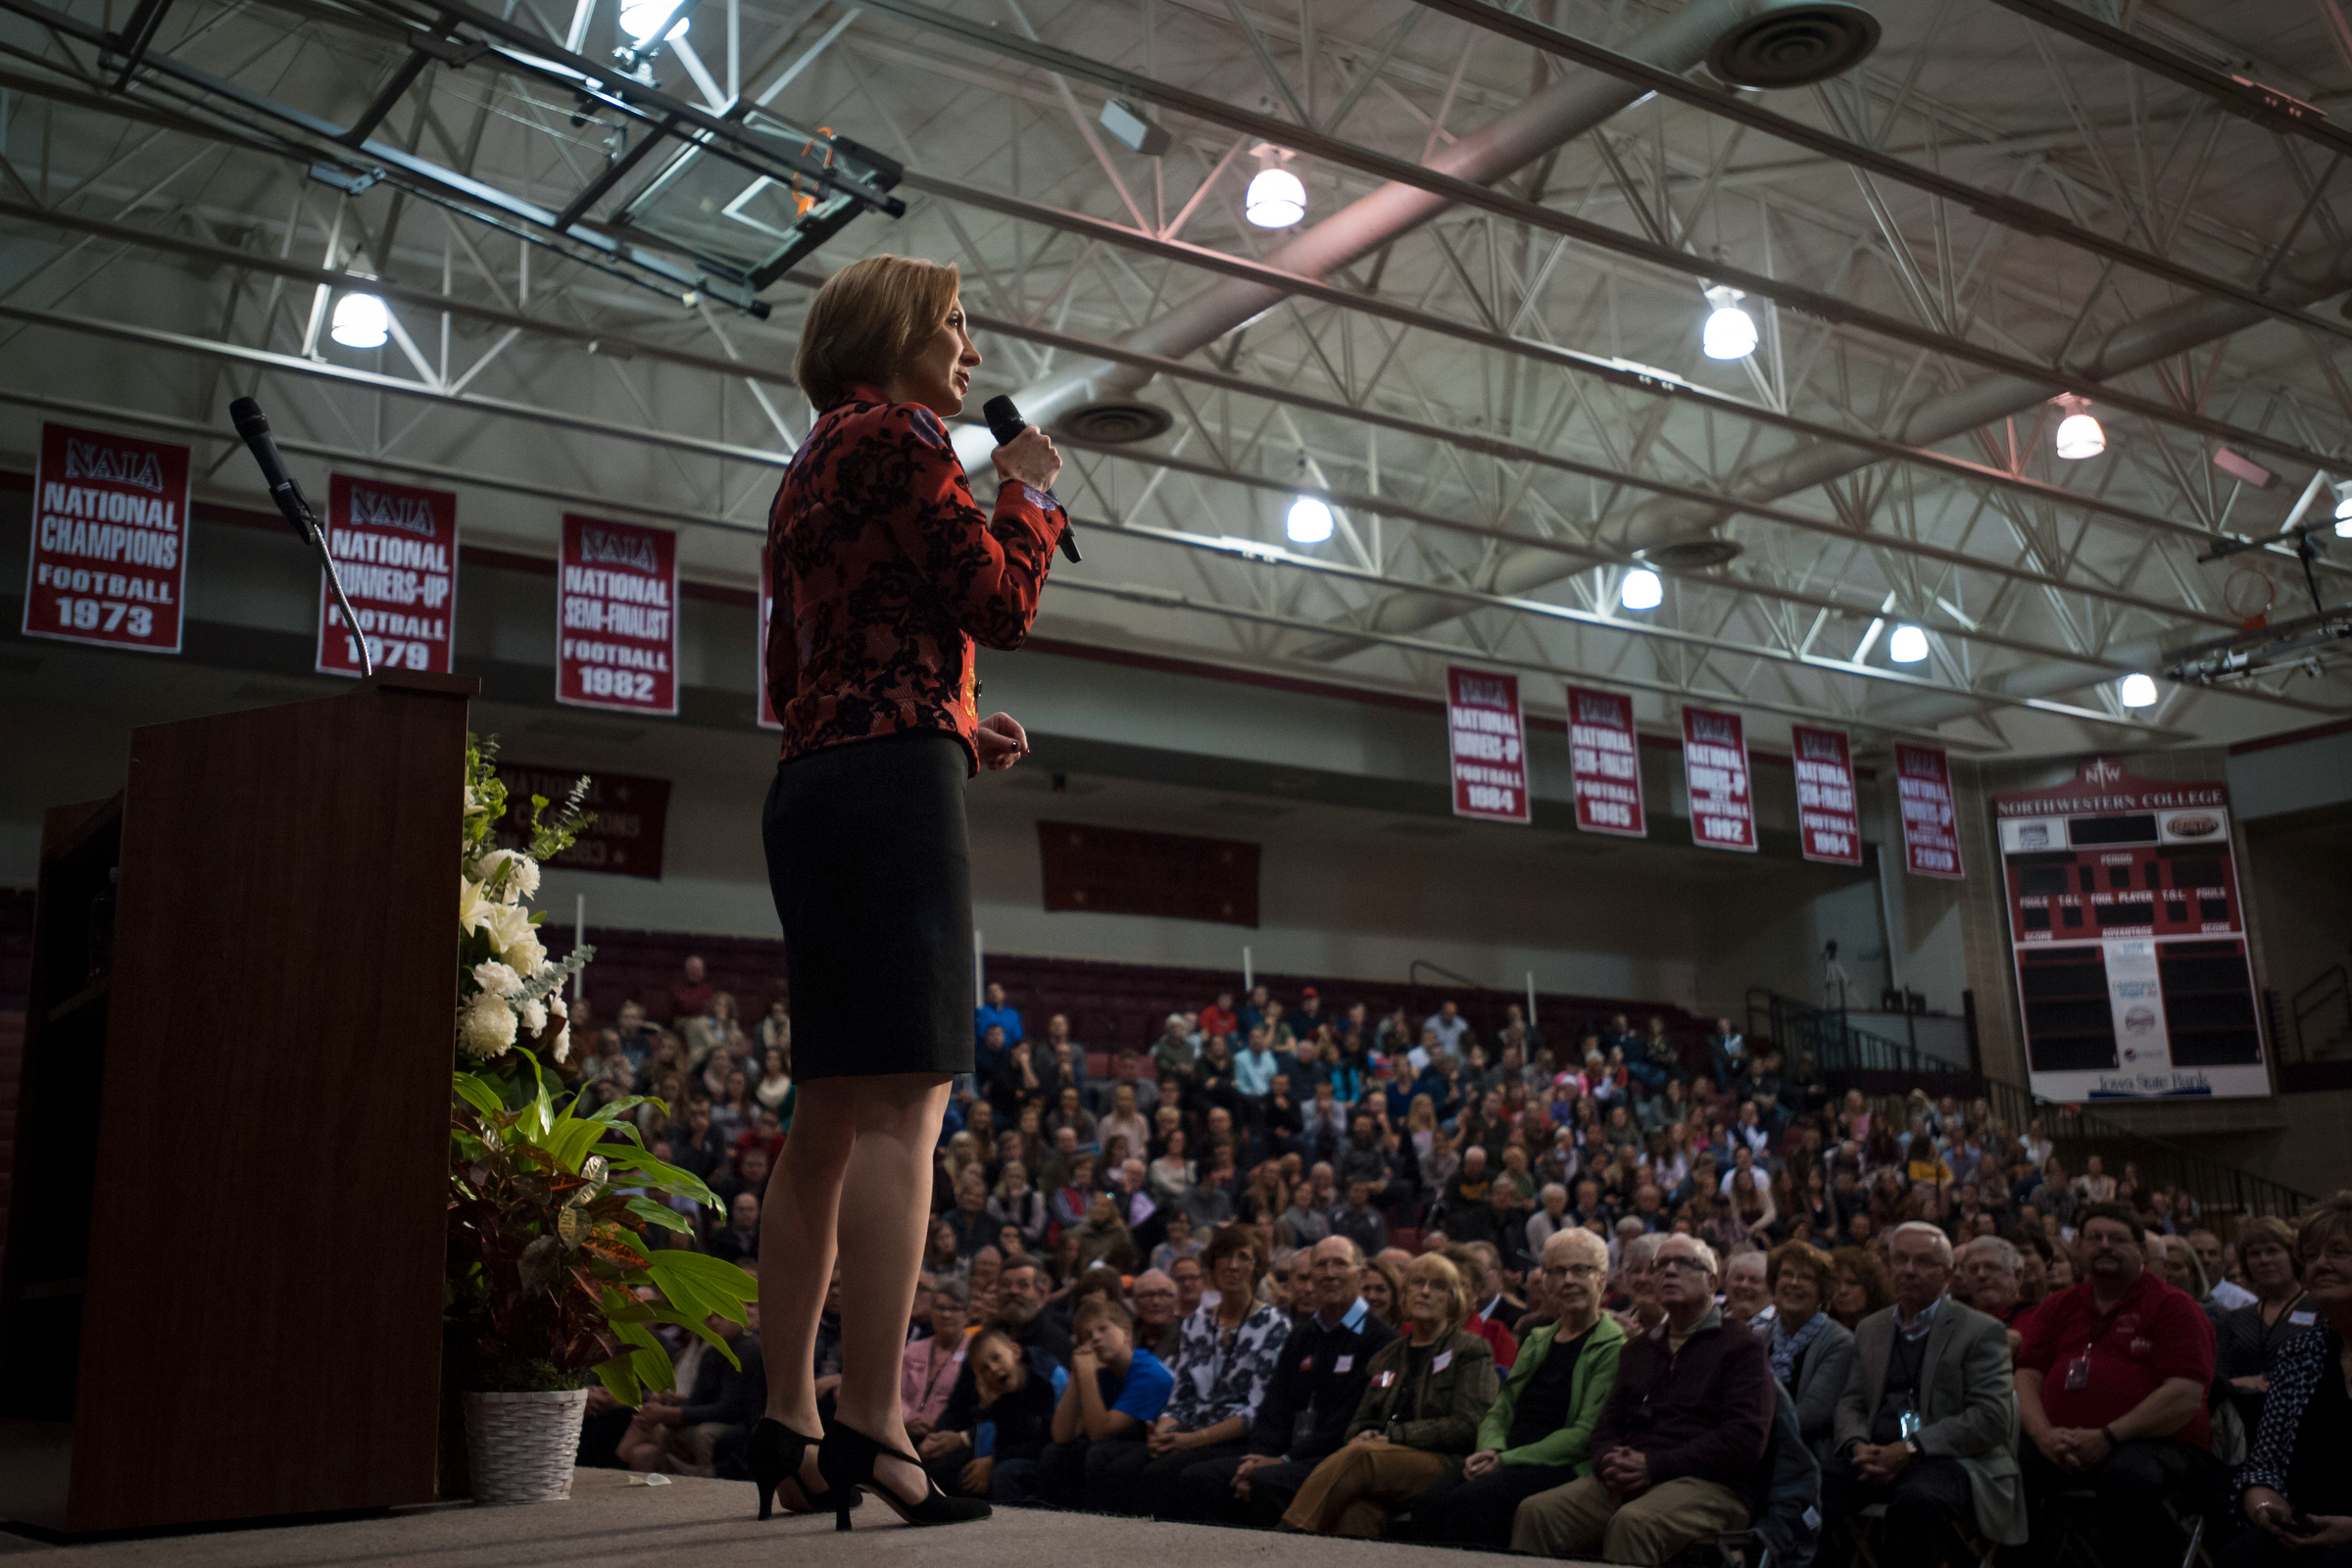 Republican presidential candidate Carly Fiorina speaks at the Northwest Iowa Republican rally at Northwestern College in Orange City, Iowa